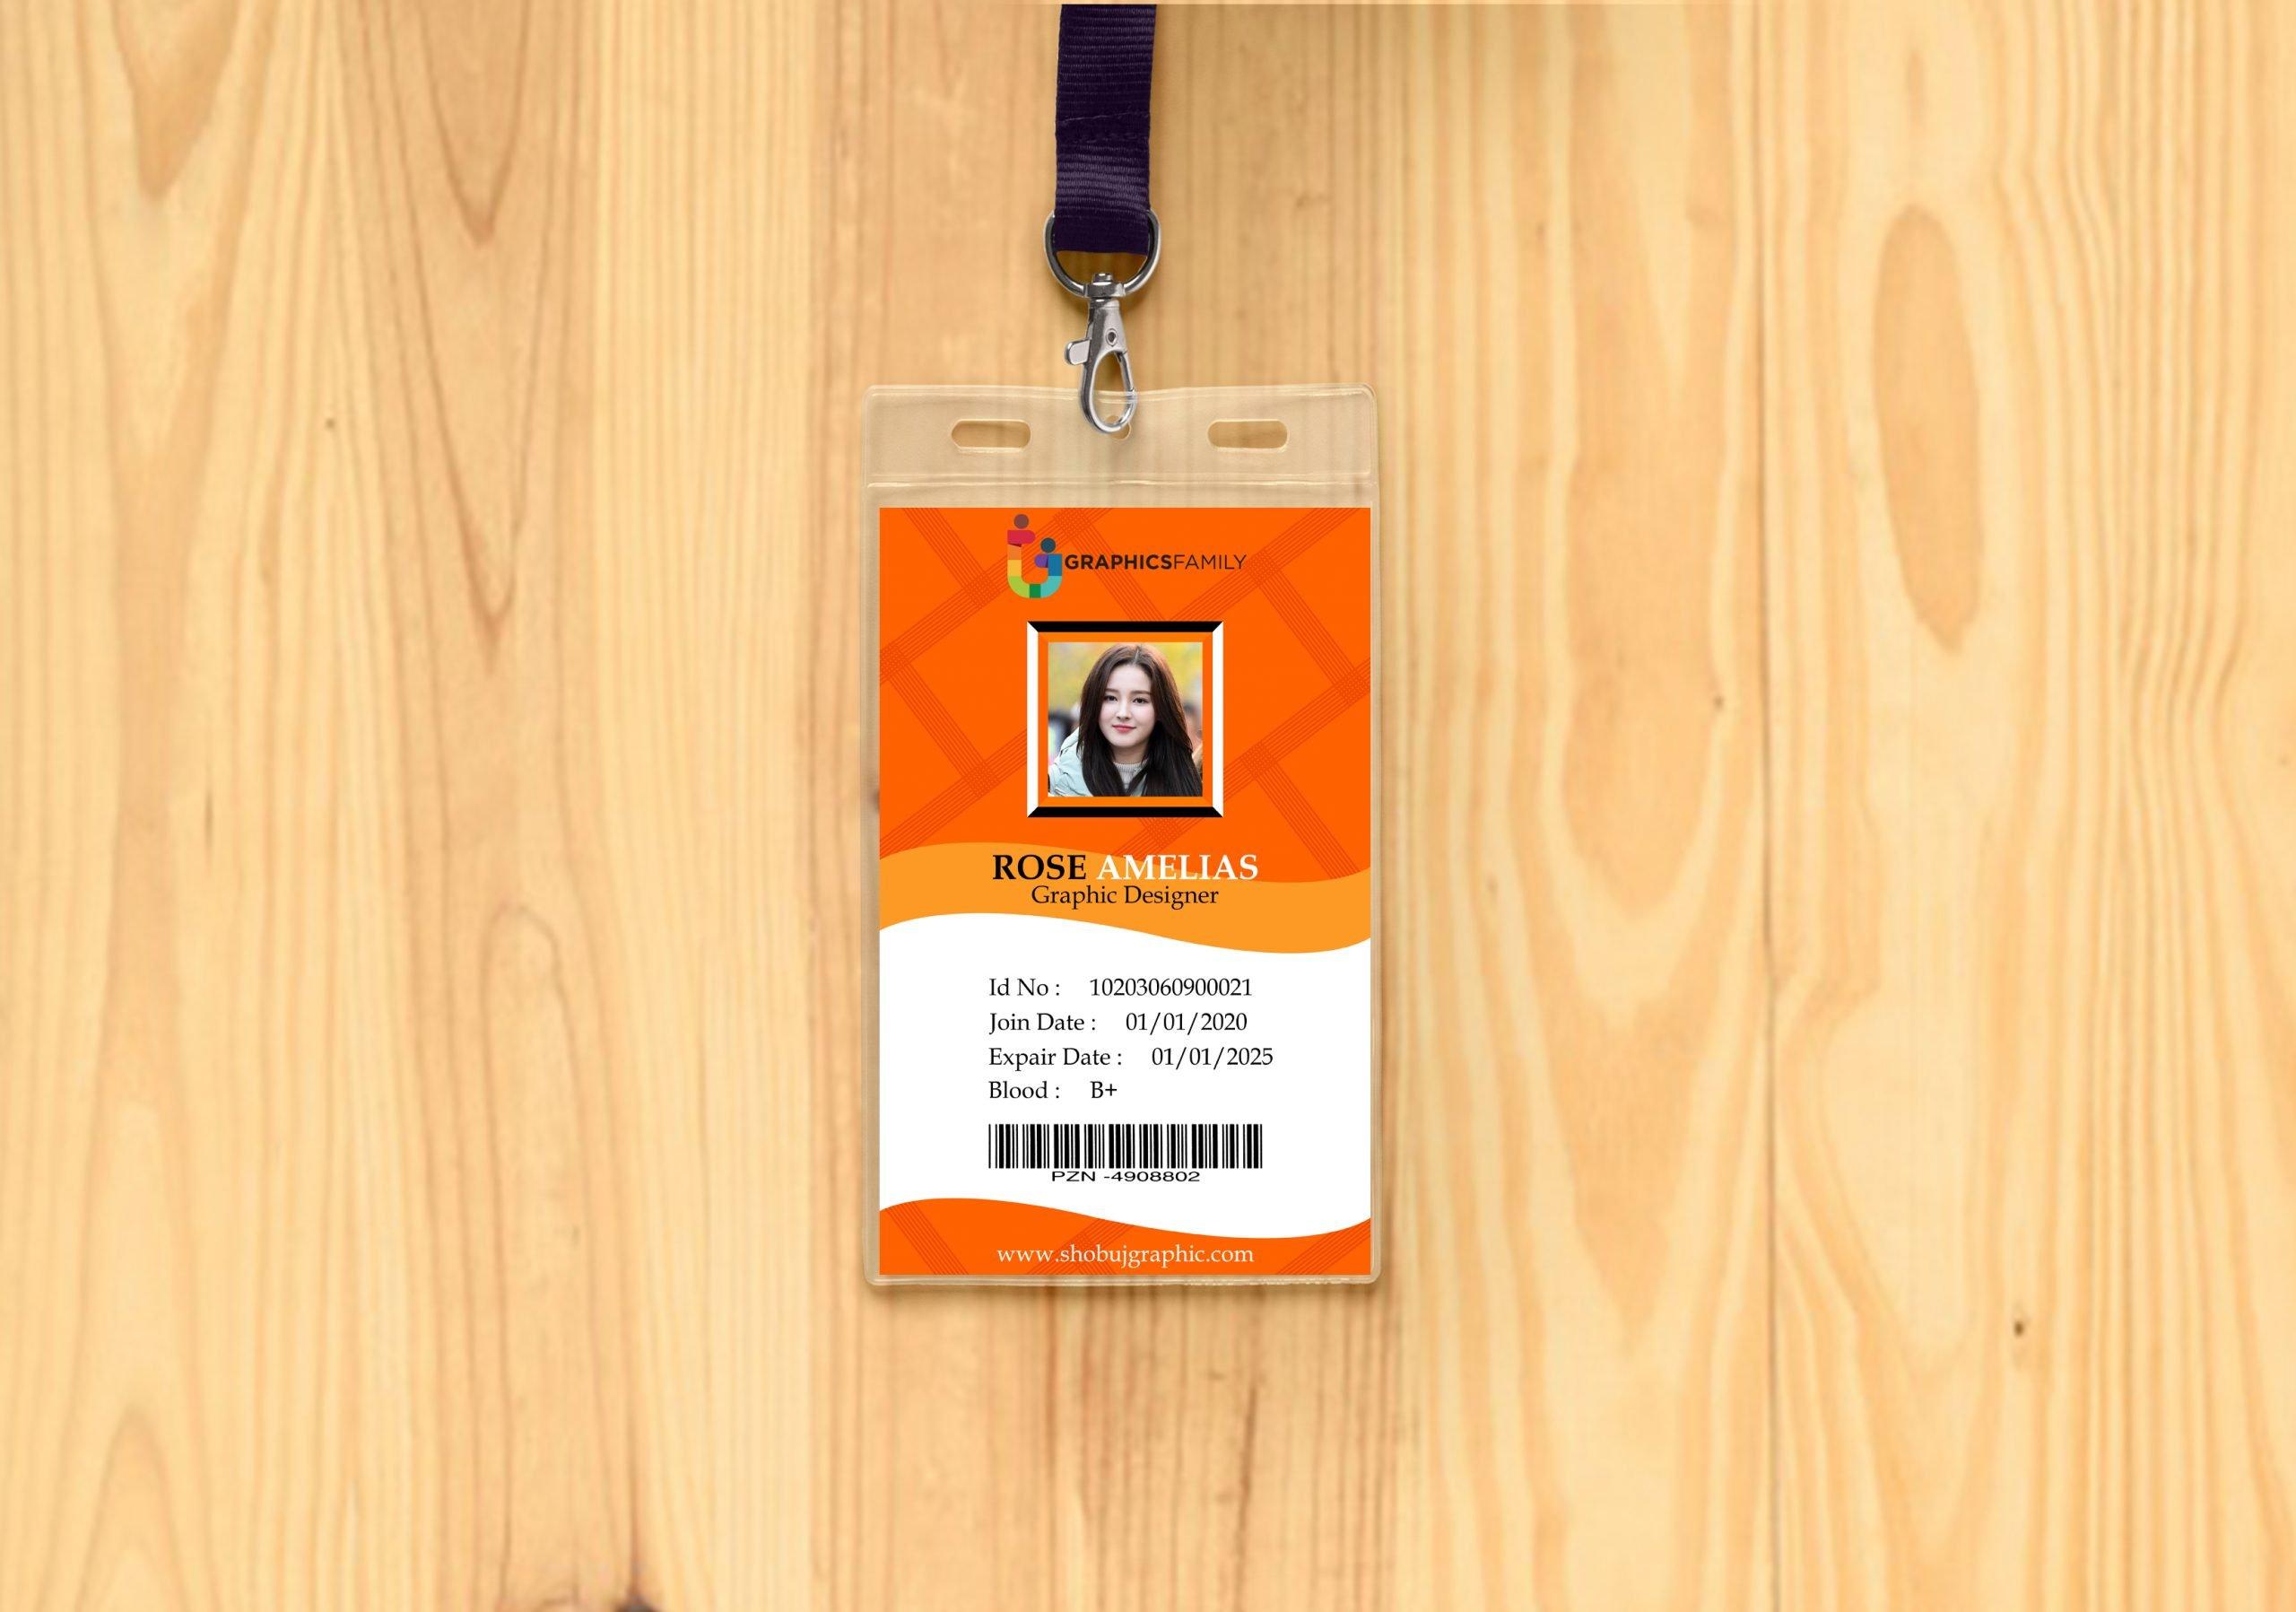 Online Marketing Id Card Design Free psd